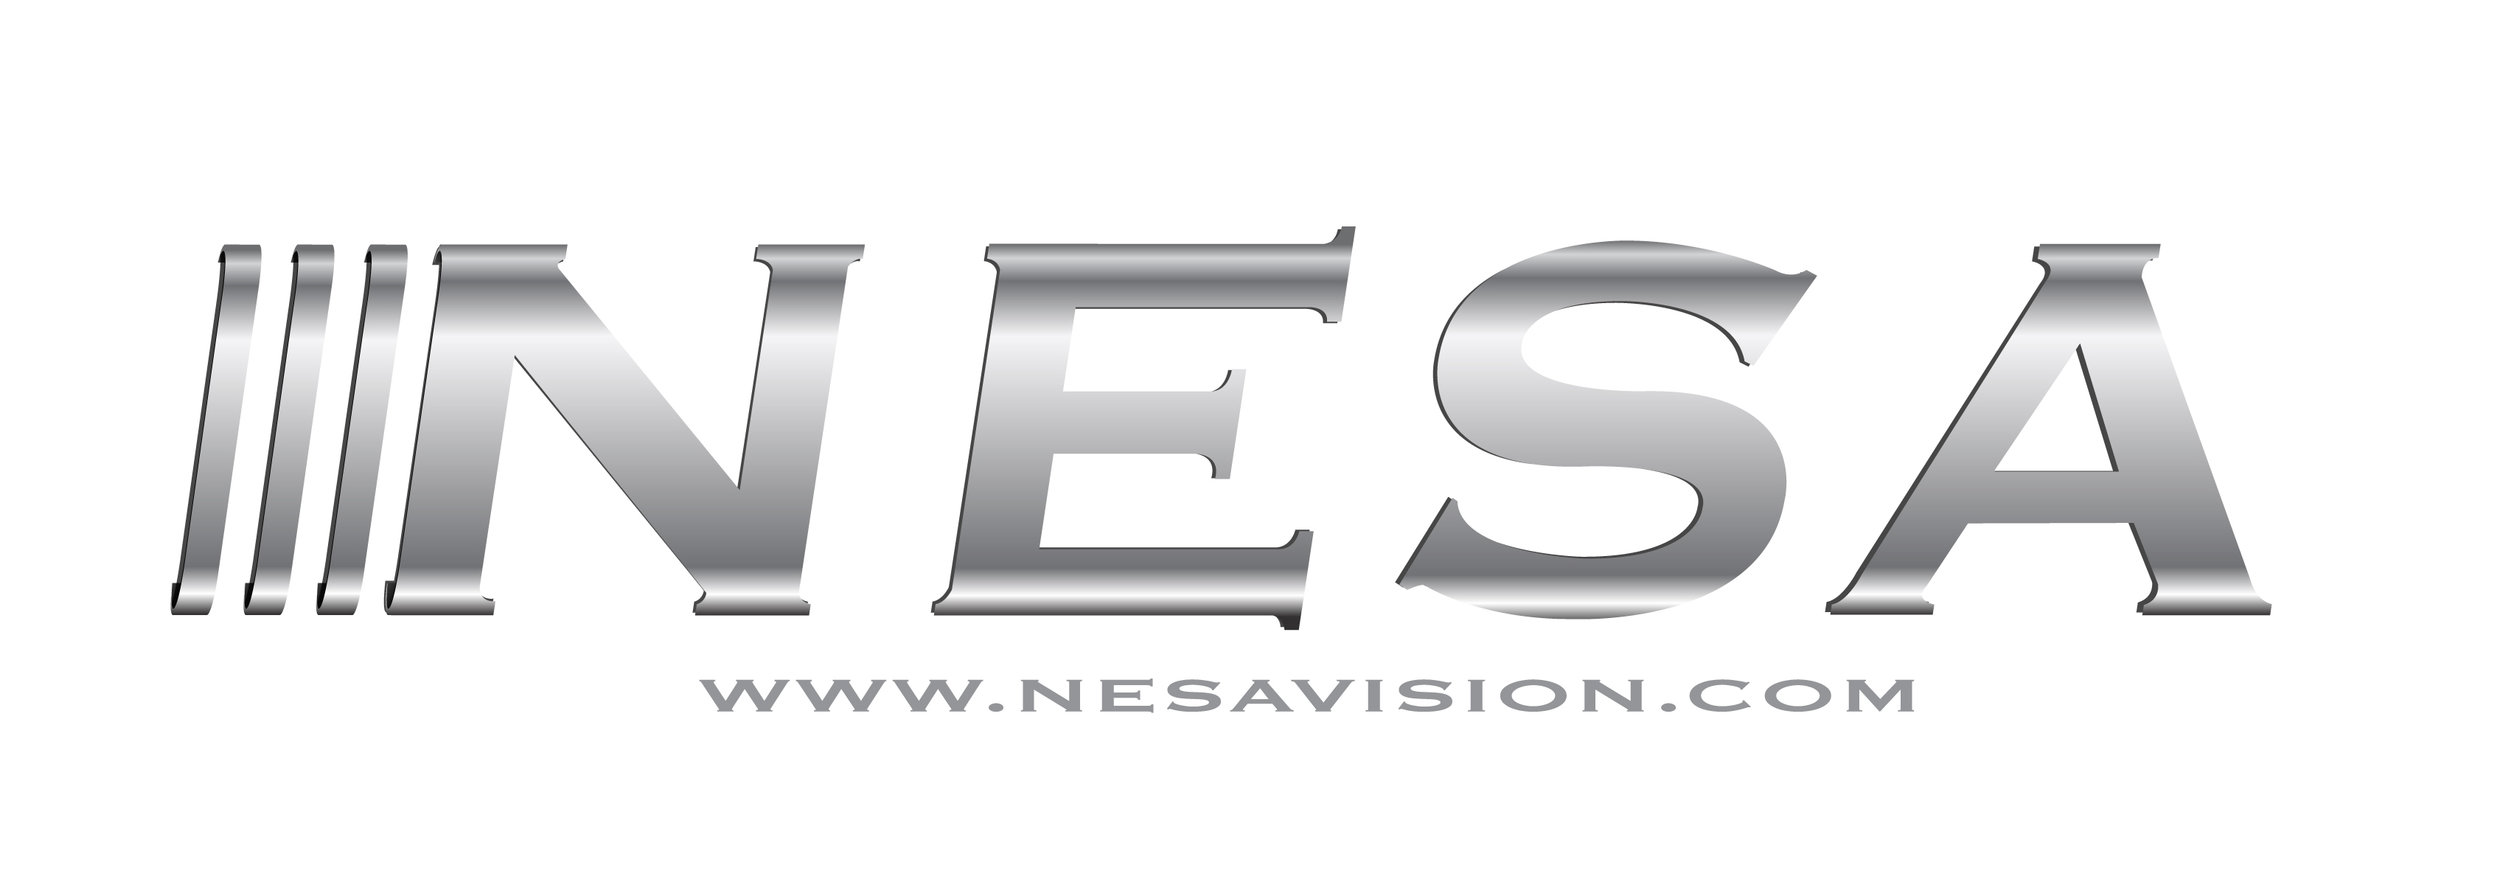 Nesa logo-01.jpg